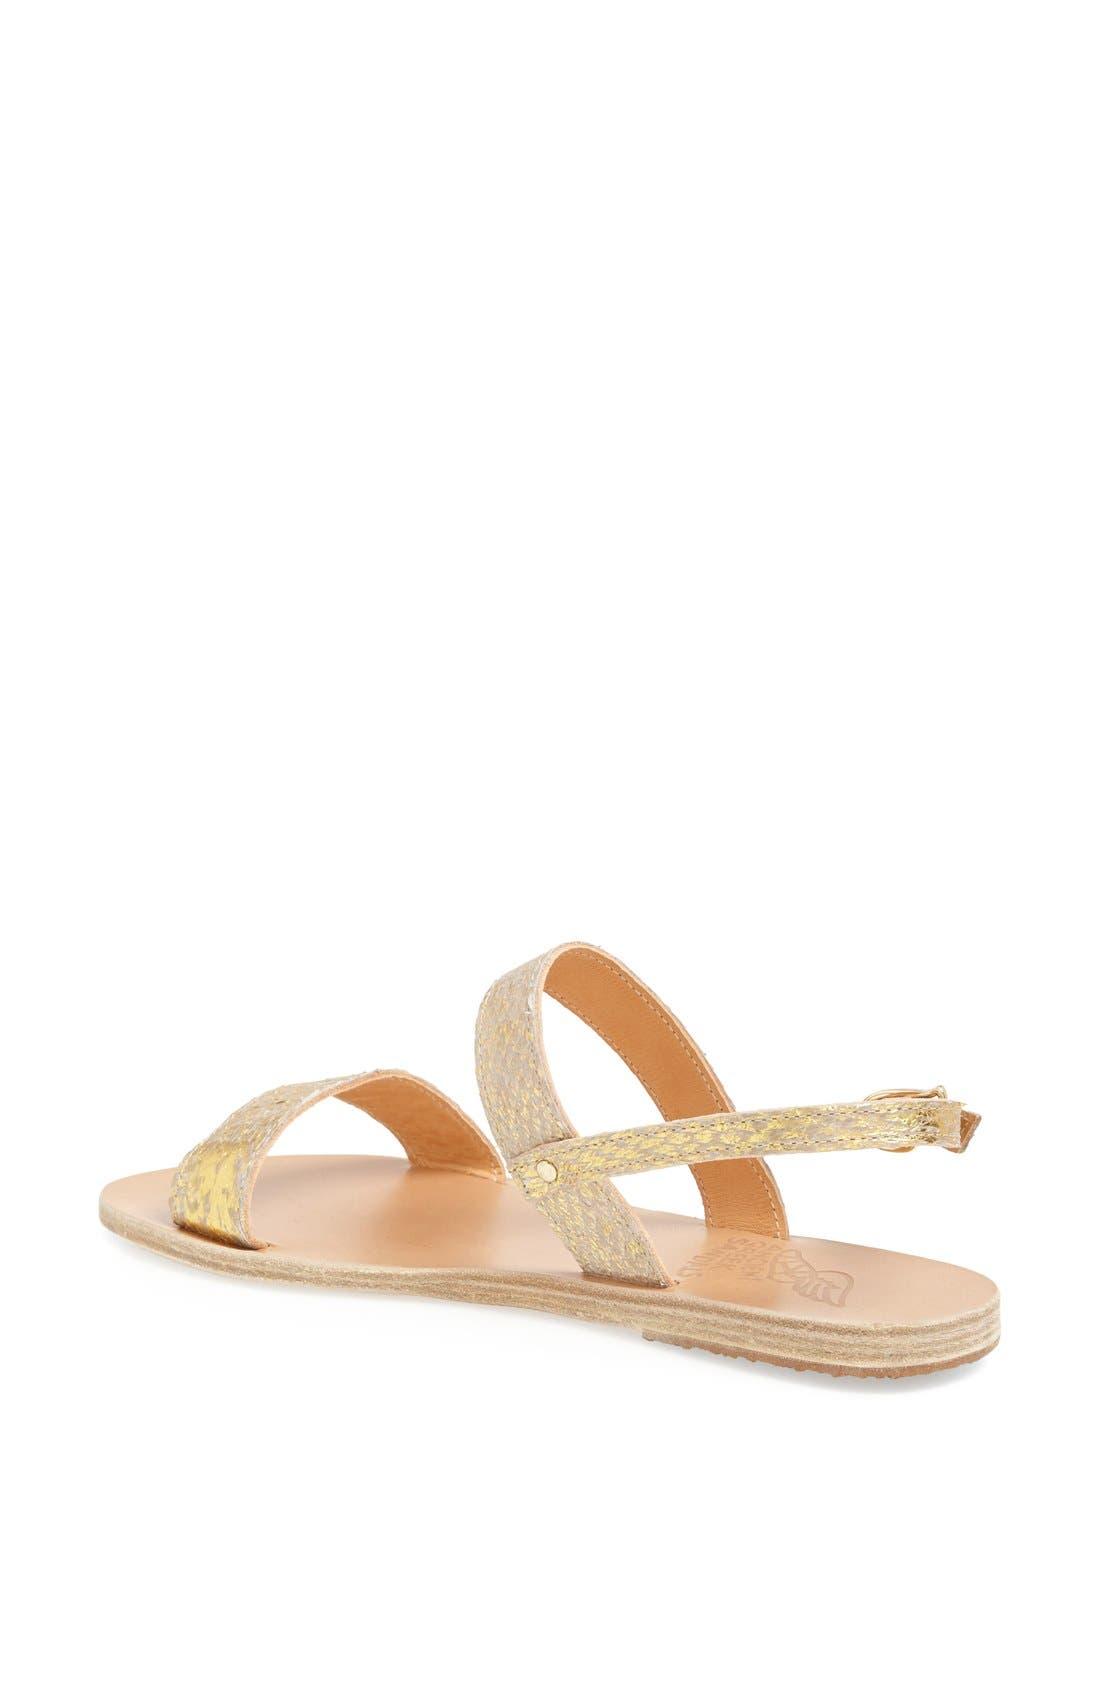 Alternate Image 2  - Ancient Greek Sandals 'Clio' Metallic Salmon Skin Sandal